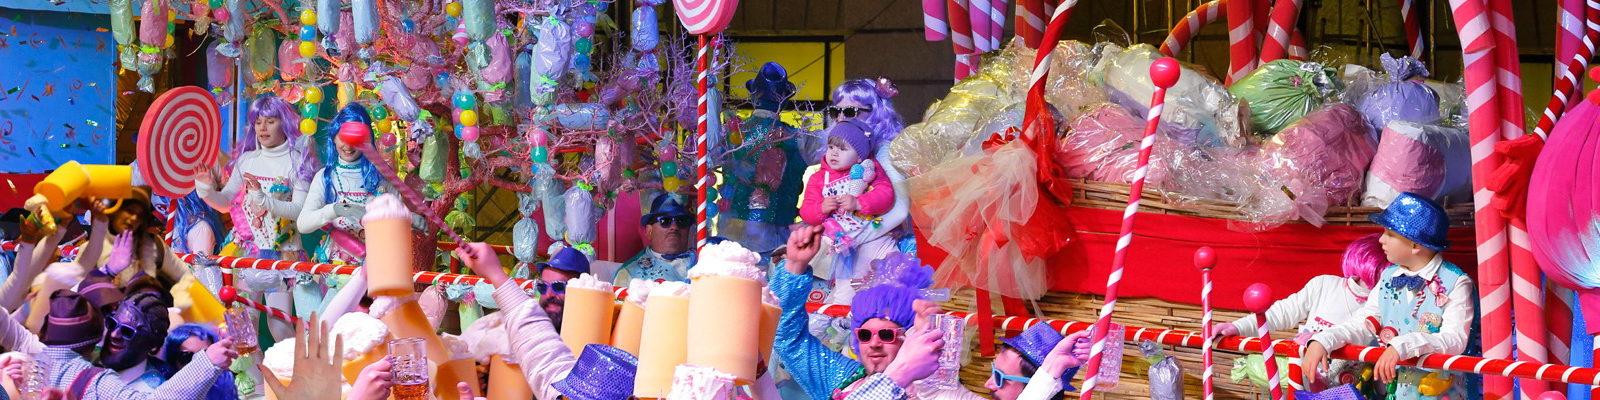 International Carnival